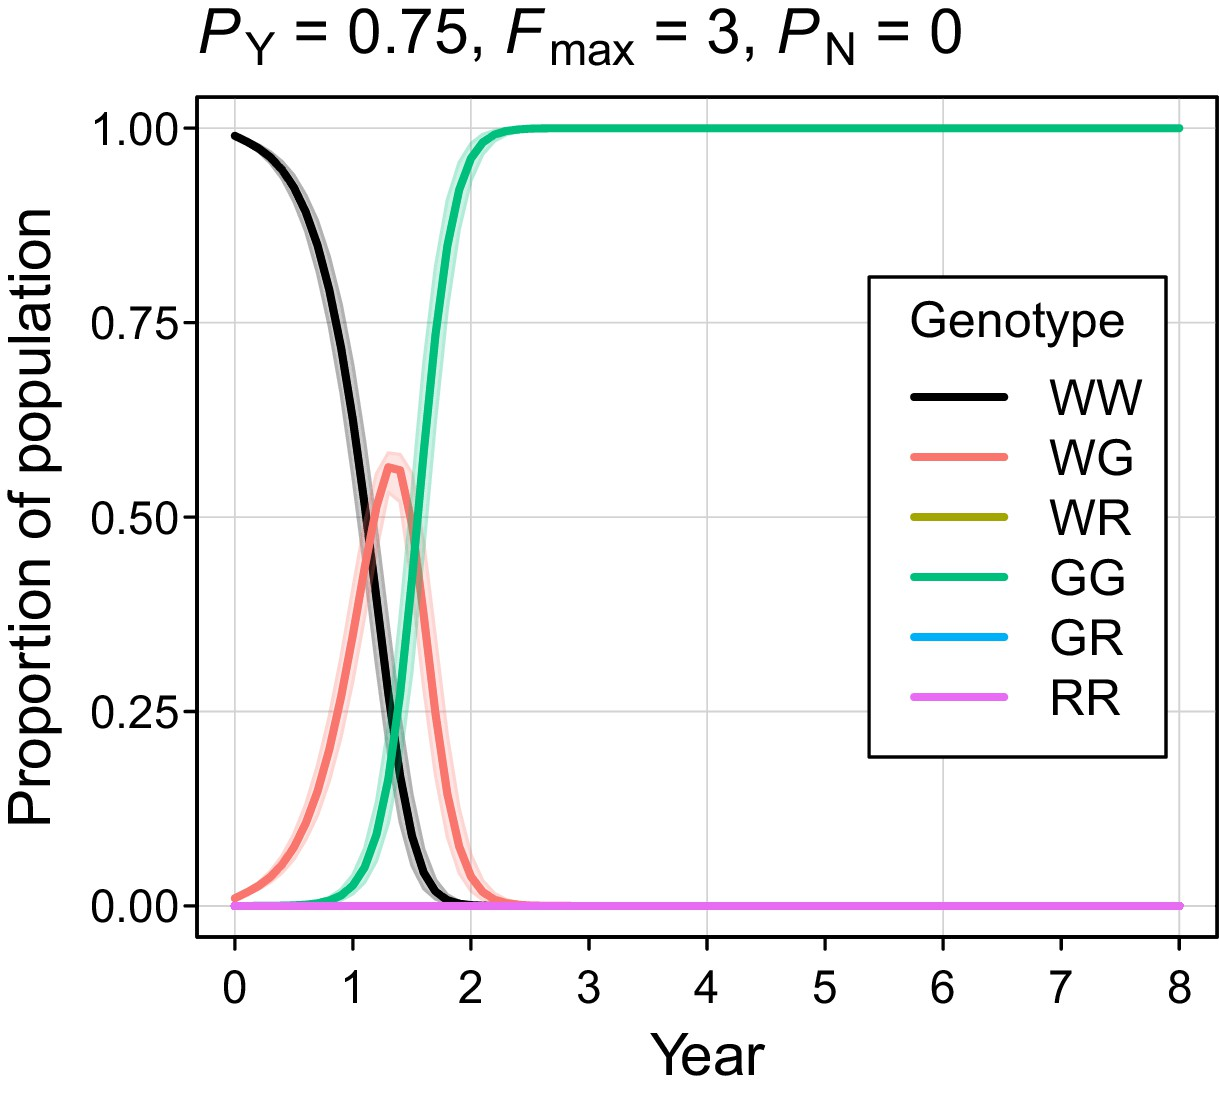 A Y-chromosome shredding gene drive for controlling pest